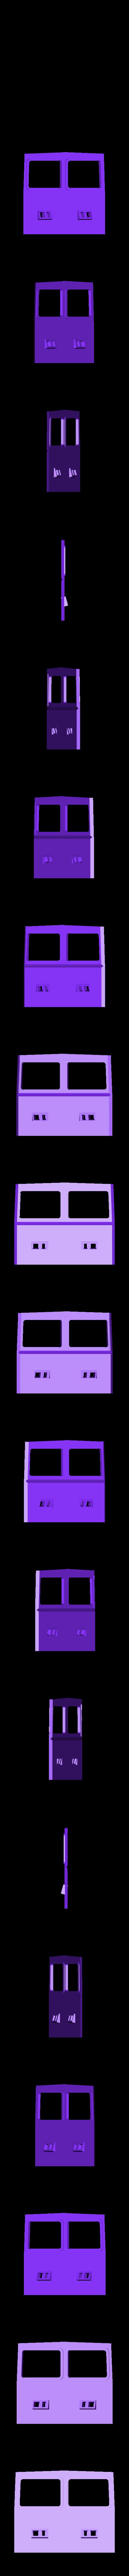 G Av cabine.STL Download STL file Draisine Matisa for LGB • 3D printable object, biddle